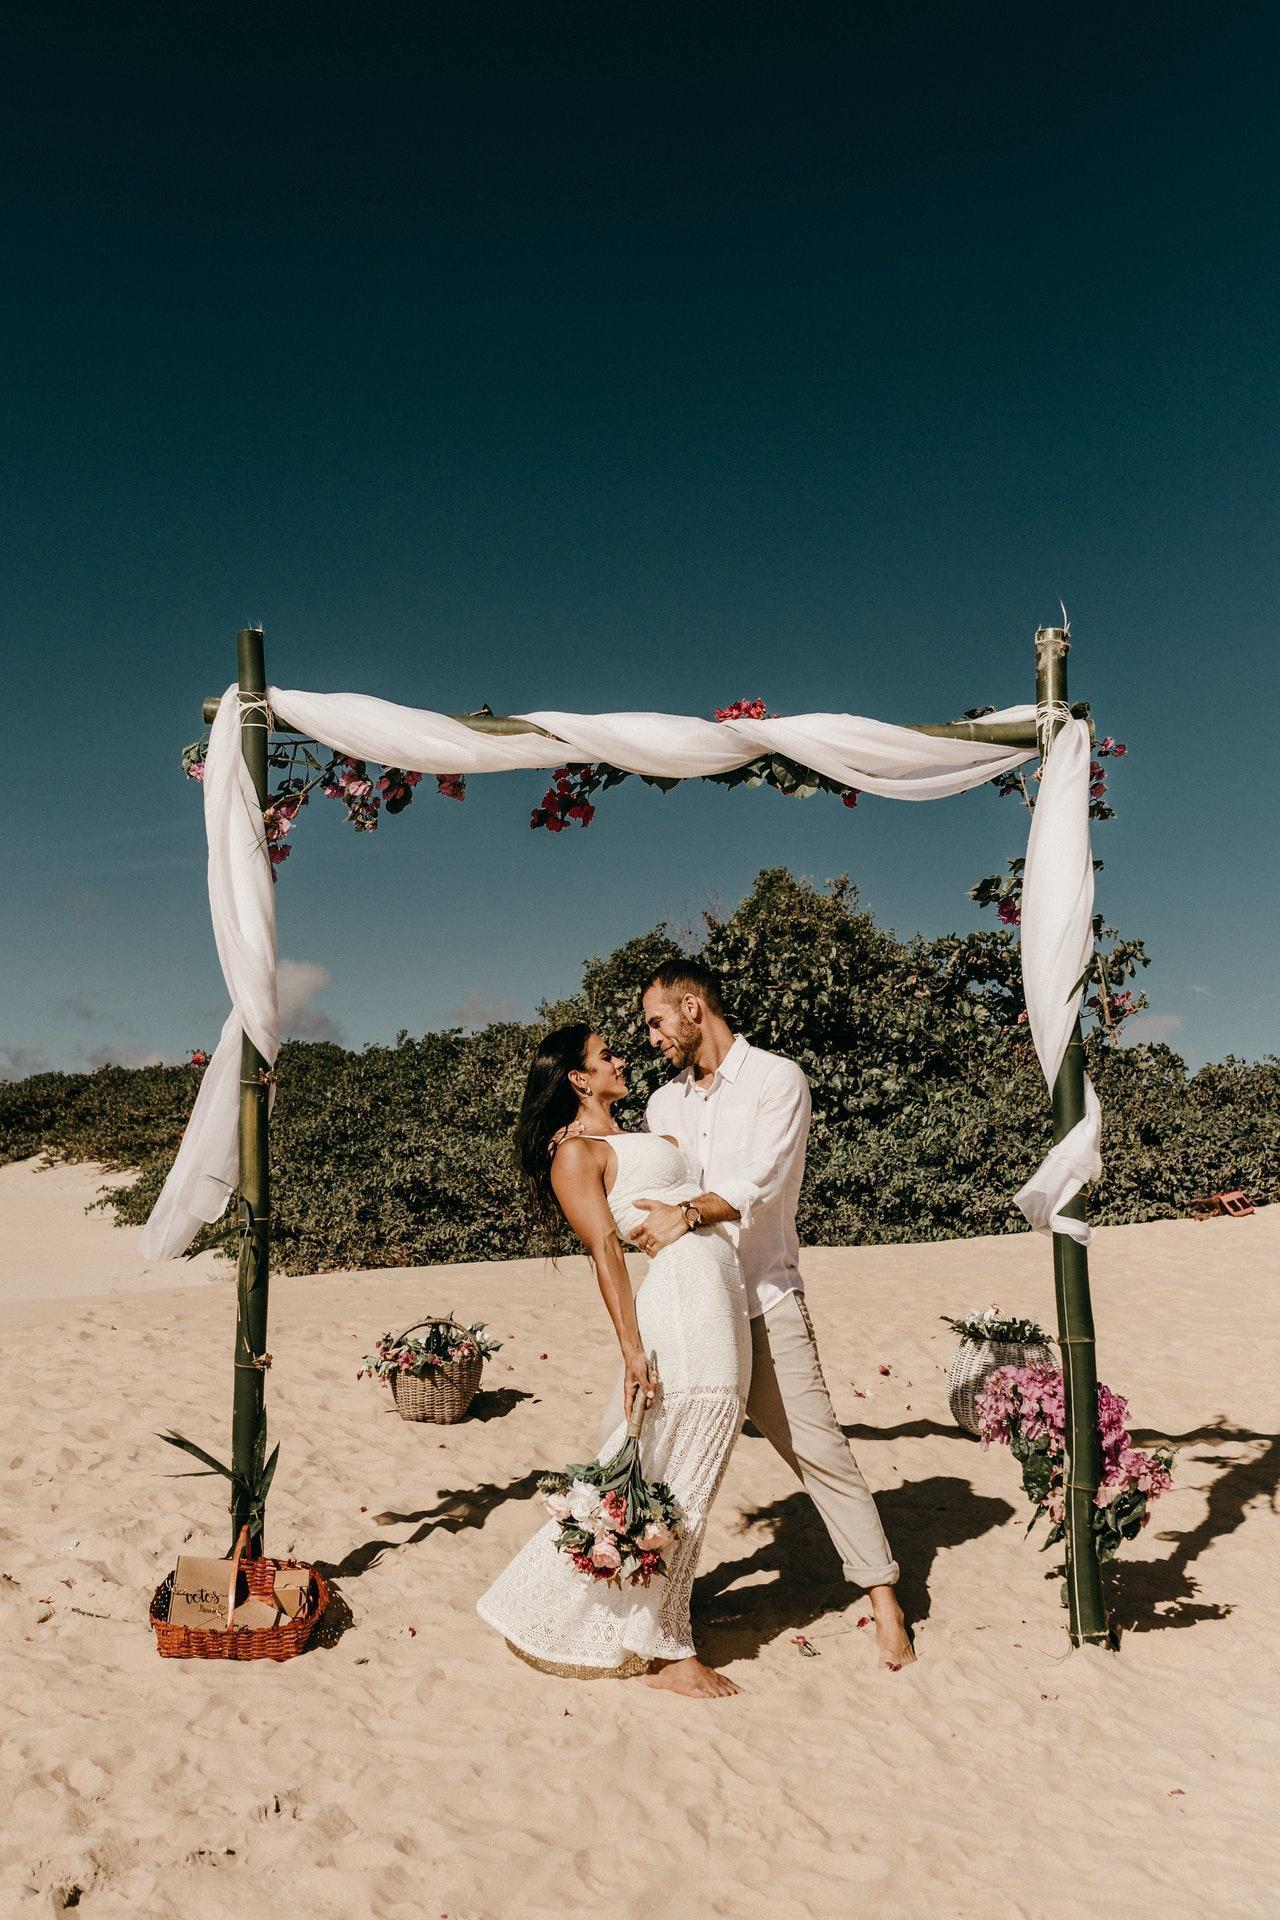 Wedding photoshoot with new married couple